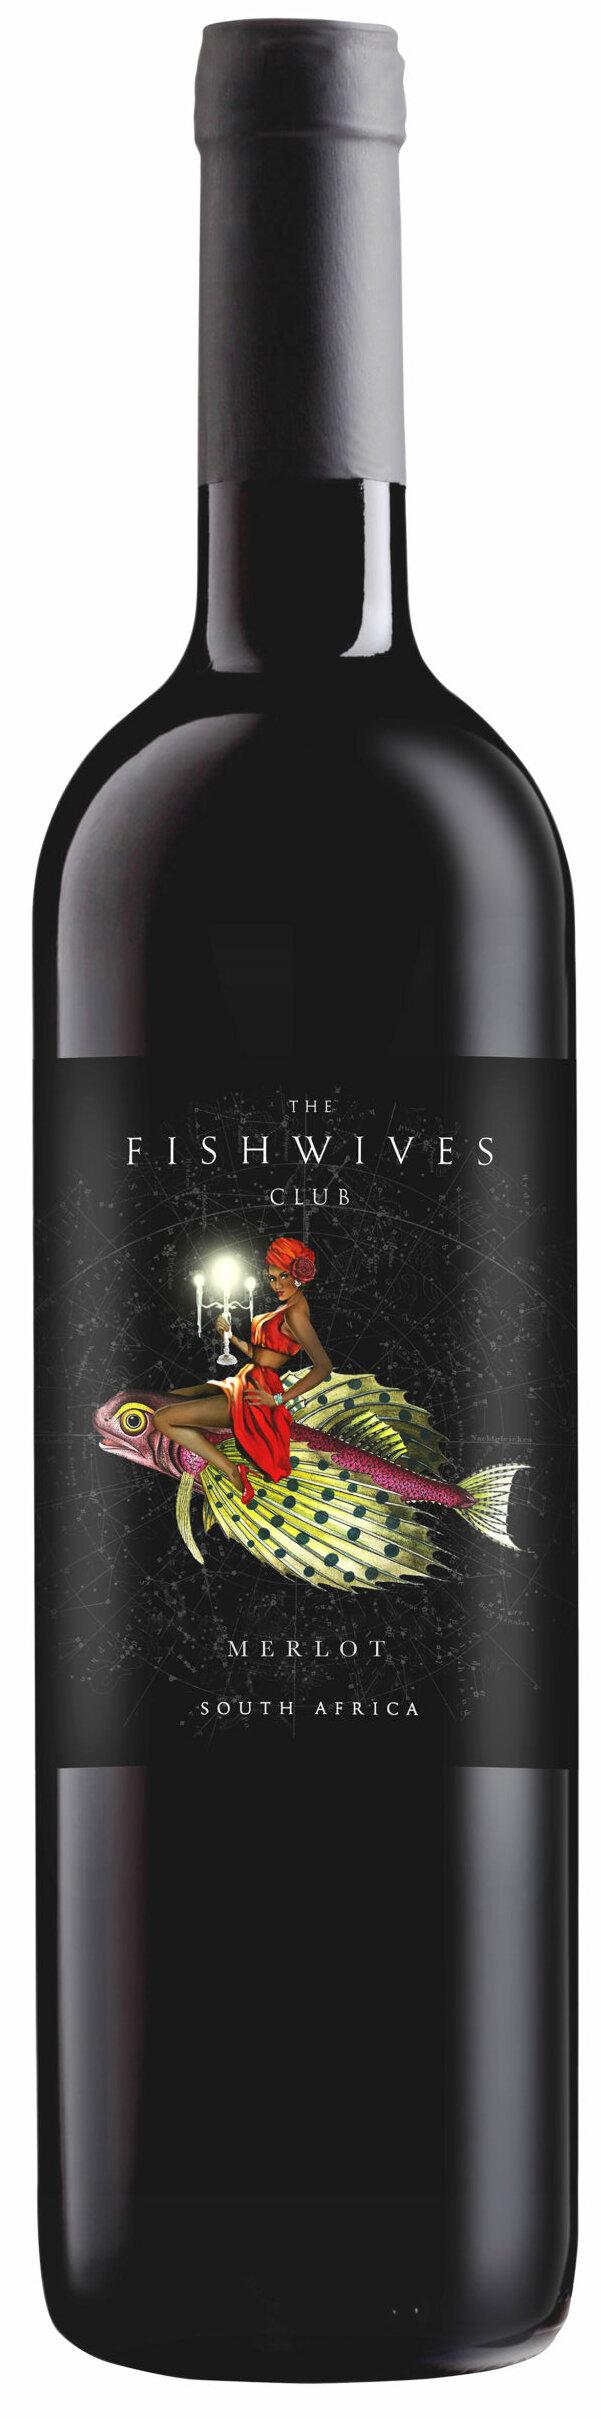 The Fishwives Club – Merlot